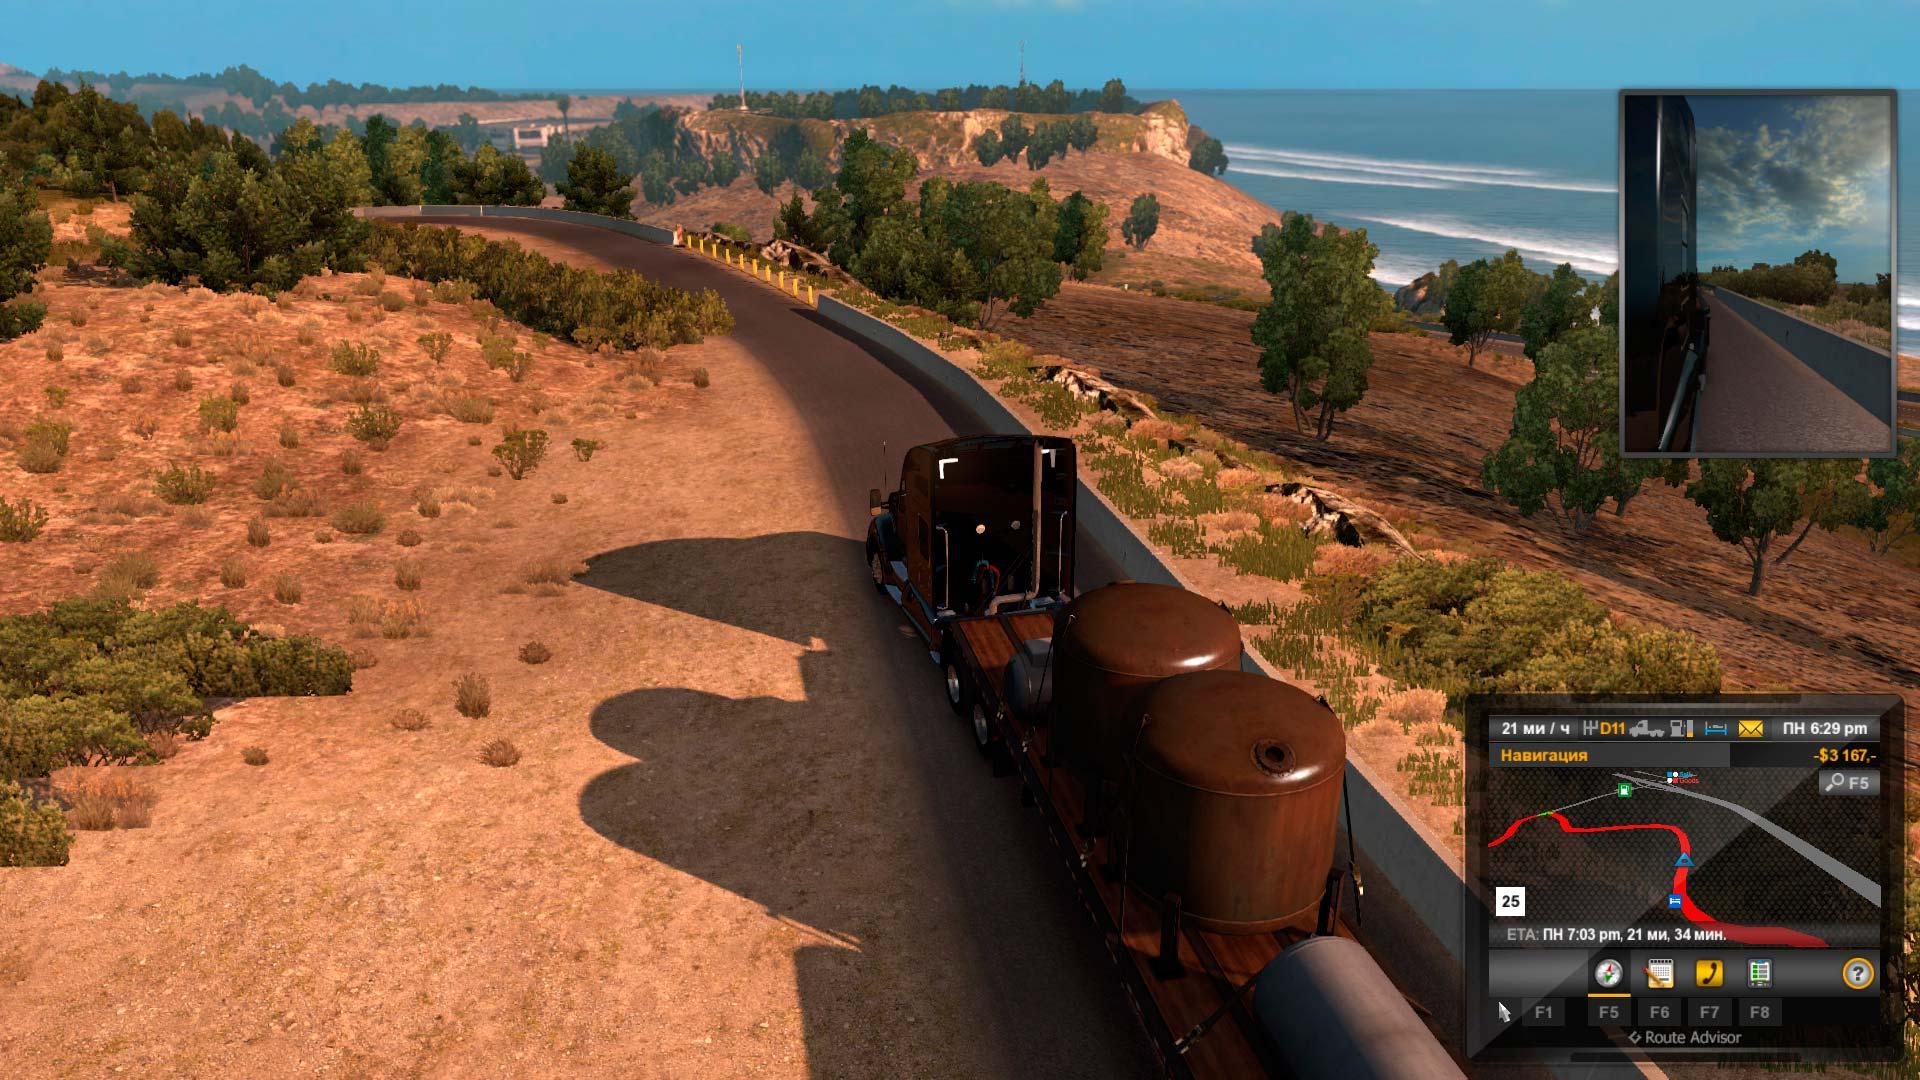 Скриншоты к American Truck Simulator (1.30.0.1s) PC на русском | RePack от xatab